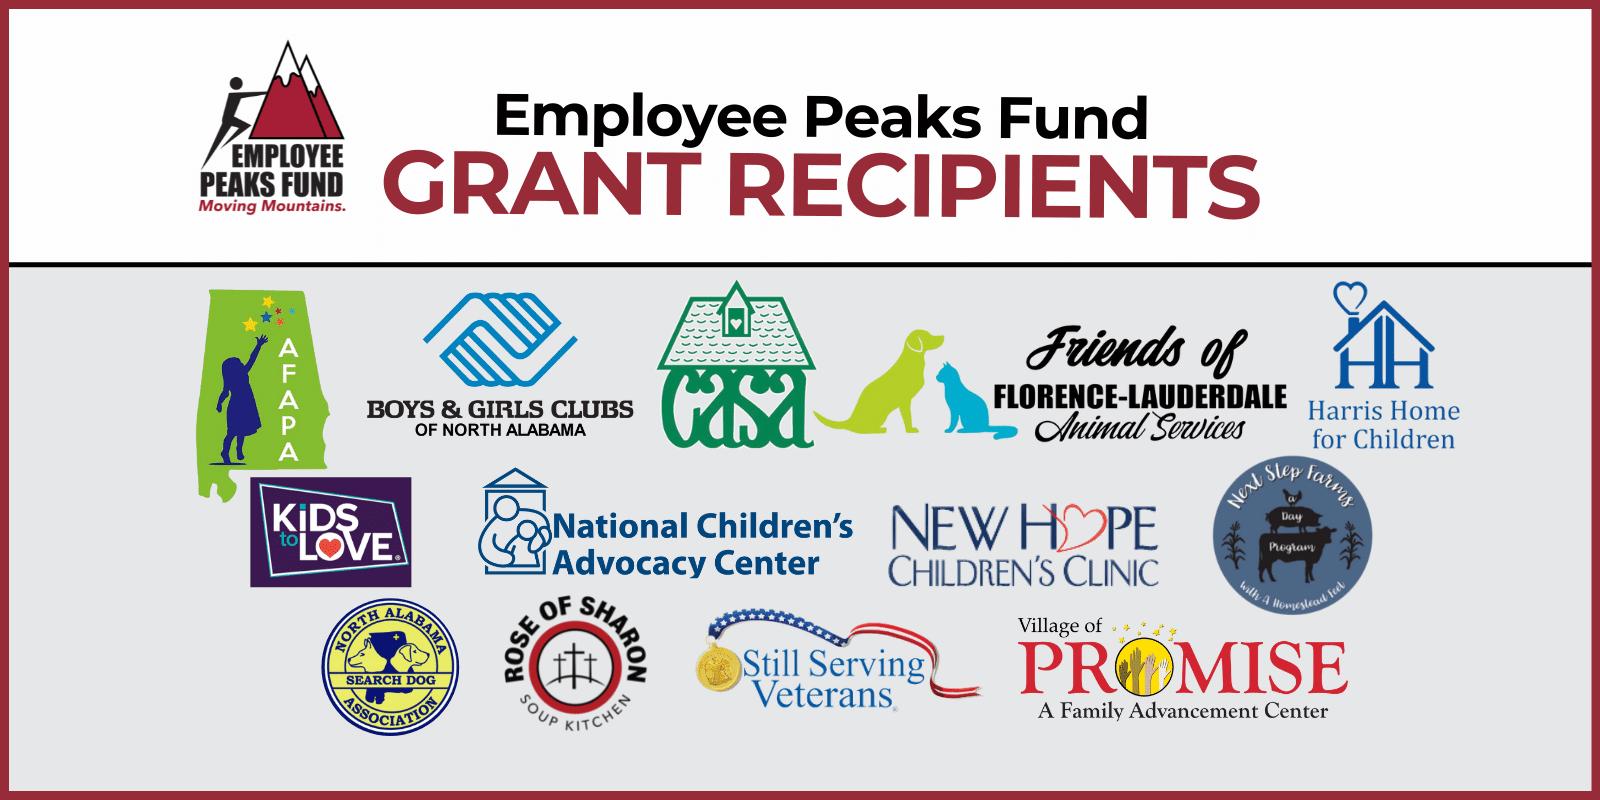 Employee Peaks Fund Grant Recipients 2021